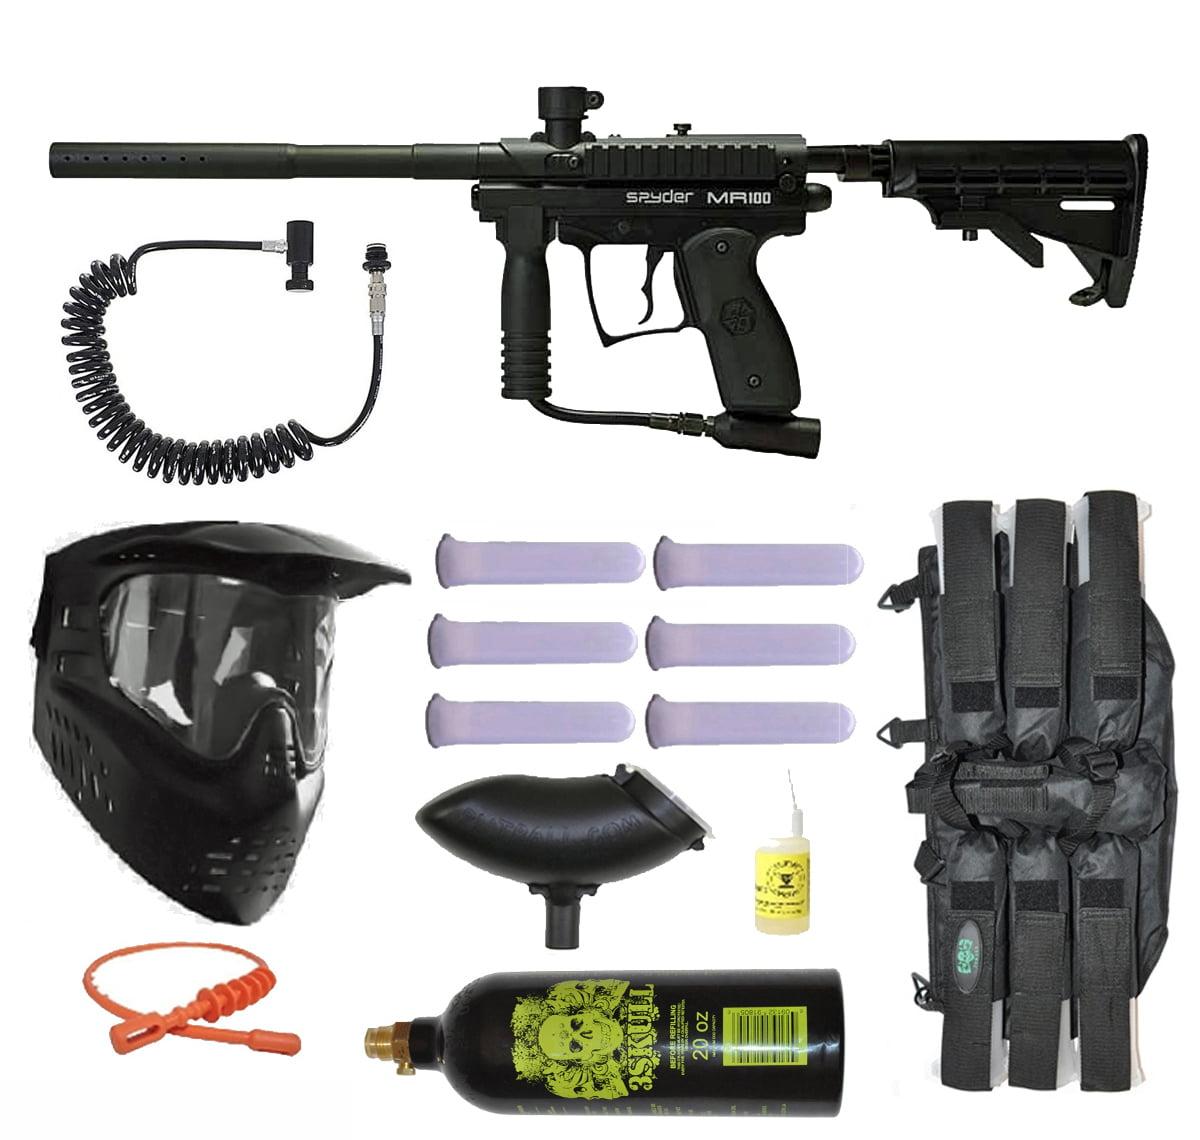 Spyder MR100 Pro Paintball Marker Gun 3Skull Remote Mega Set Black by